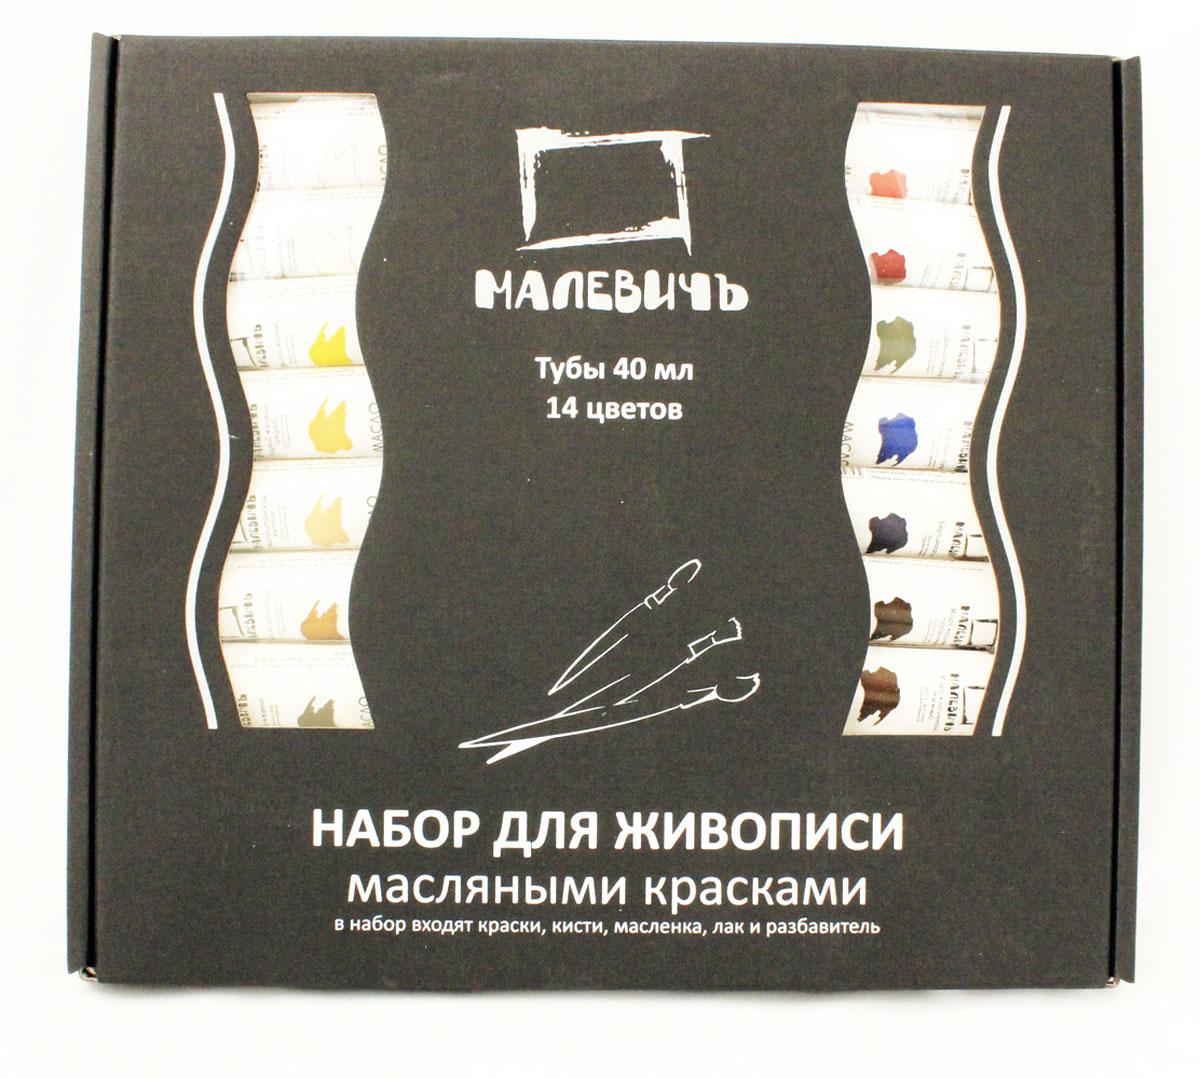 Малевичъ Набор для живописи масляными красками Профи 14 цветов